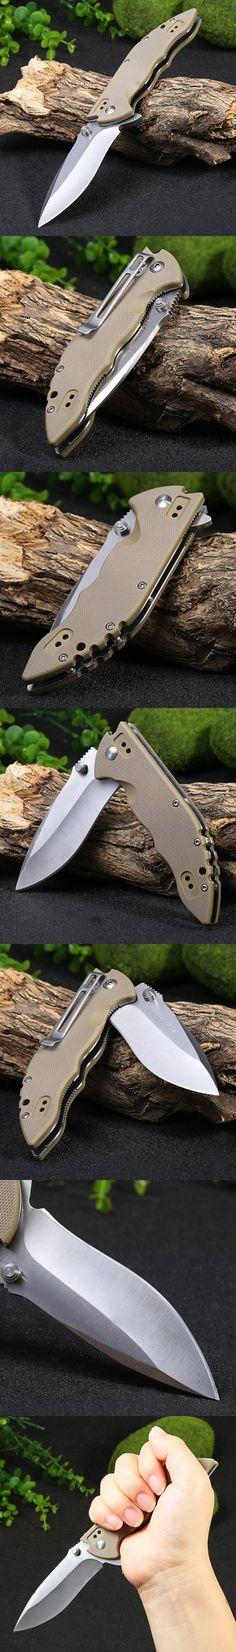 Pocket Knives and Folding Knives | Sanrenmu 9054 SUC-GV 58HRC Folding Knife